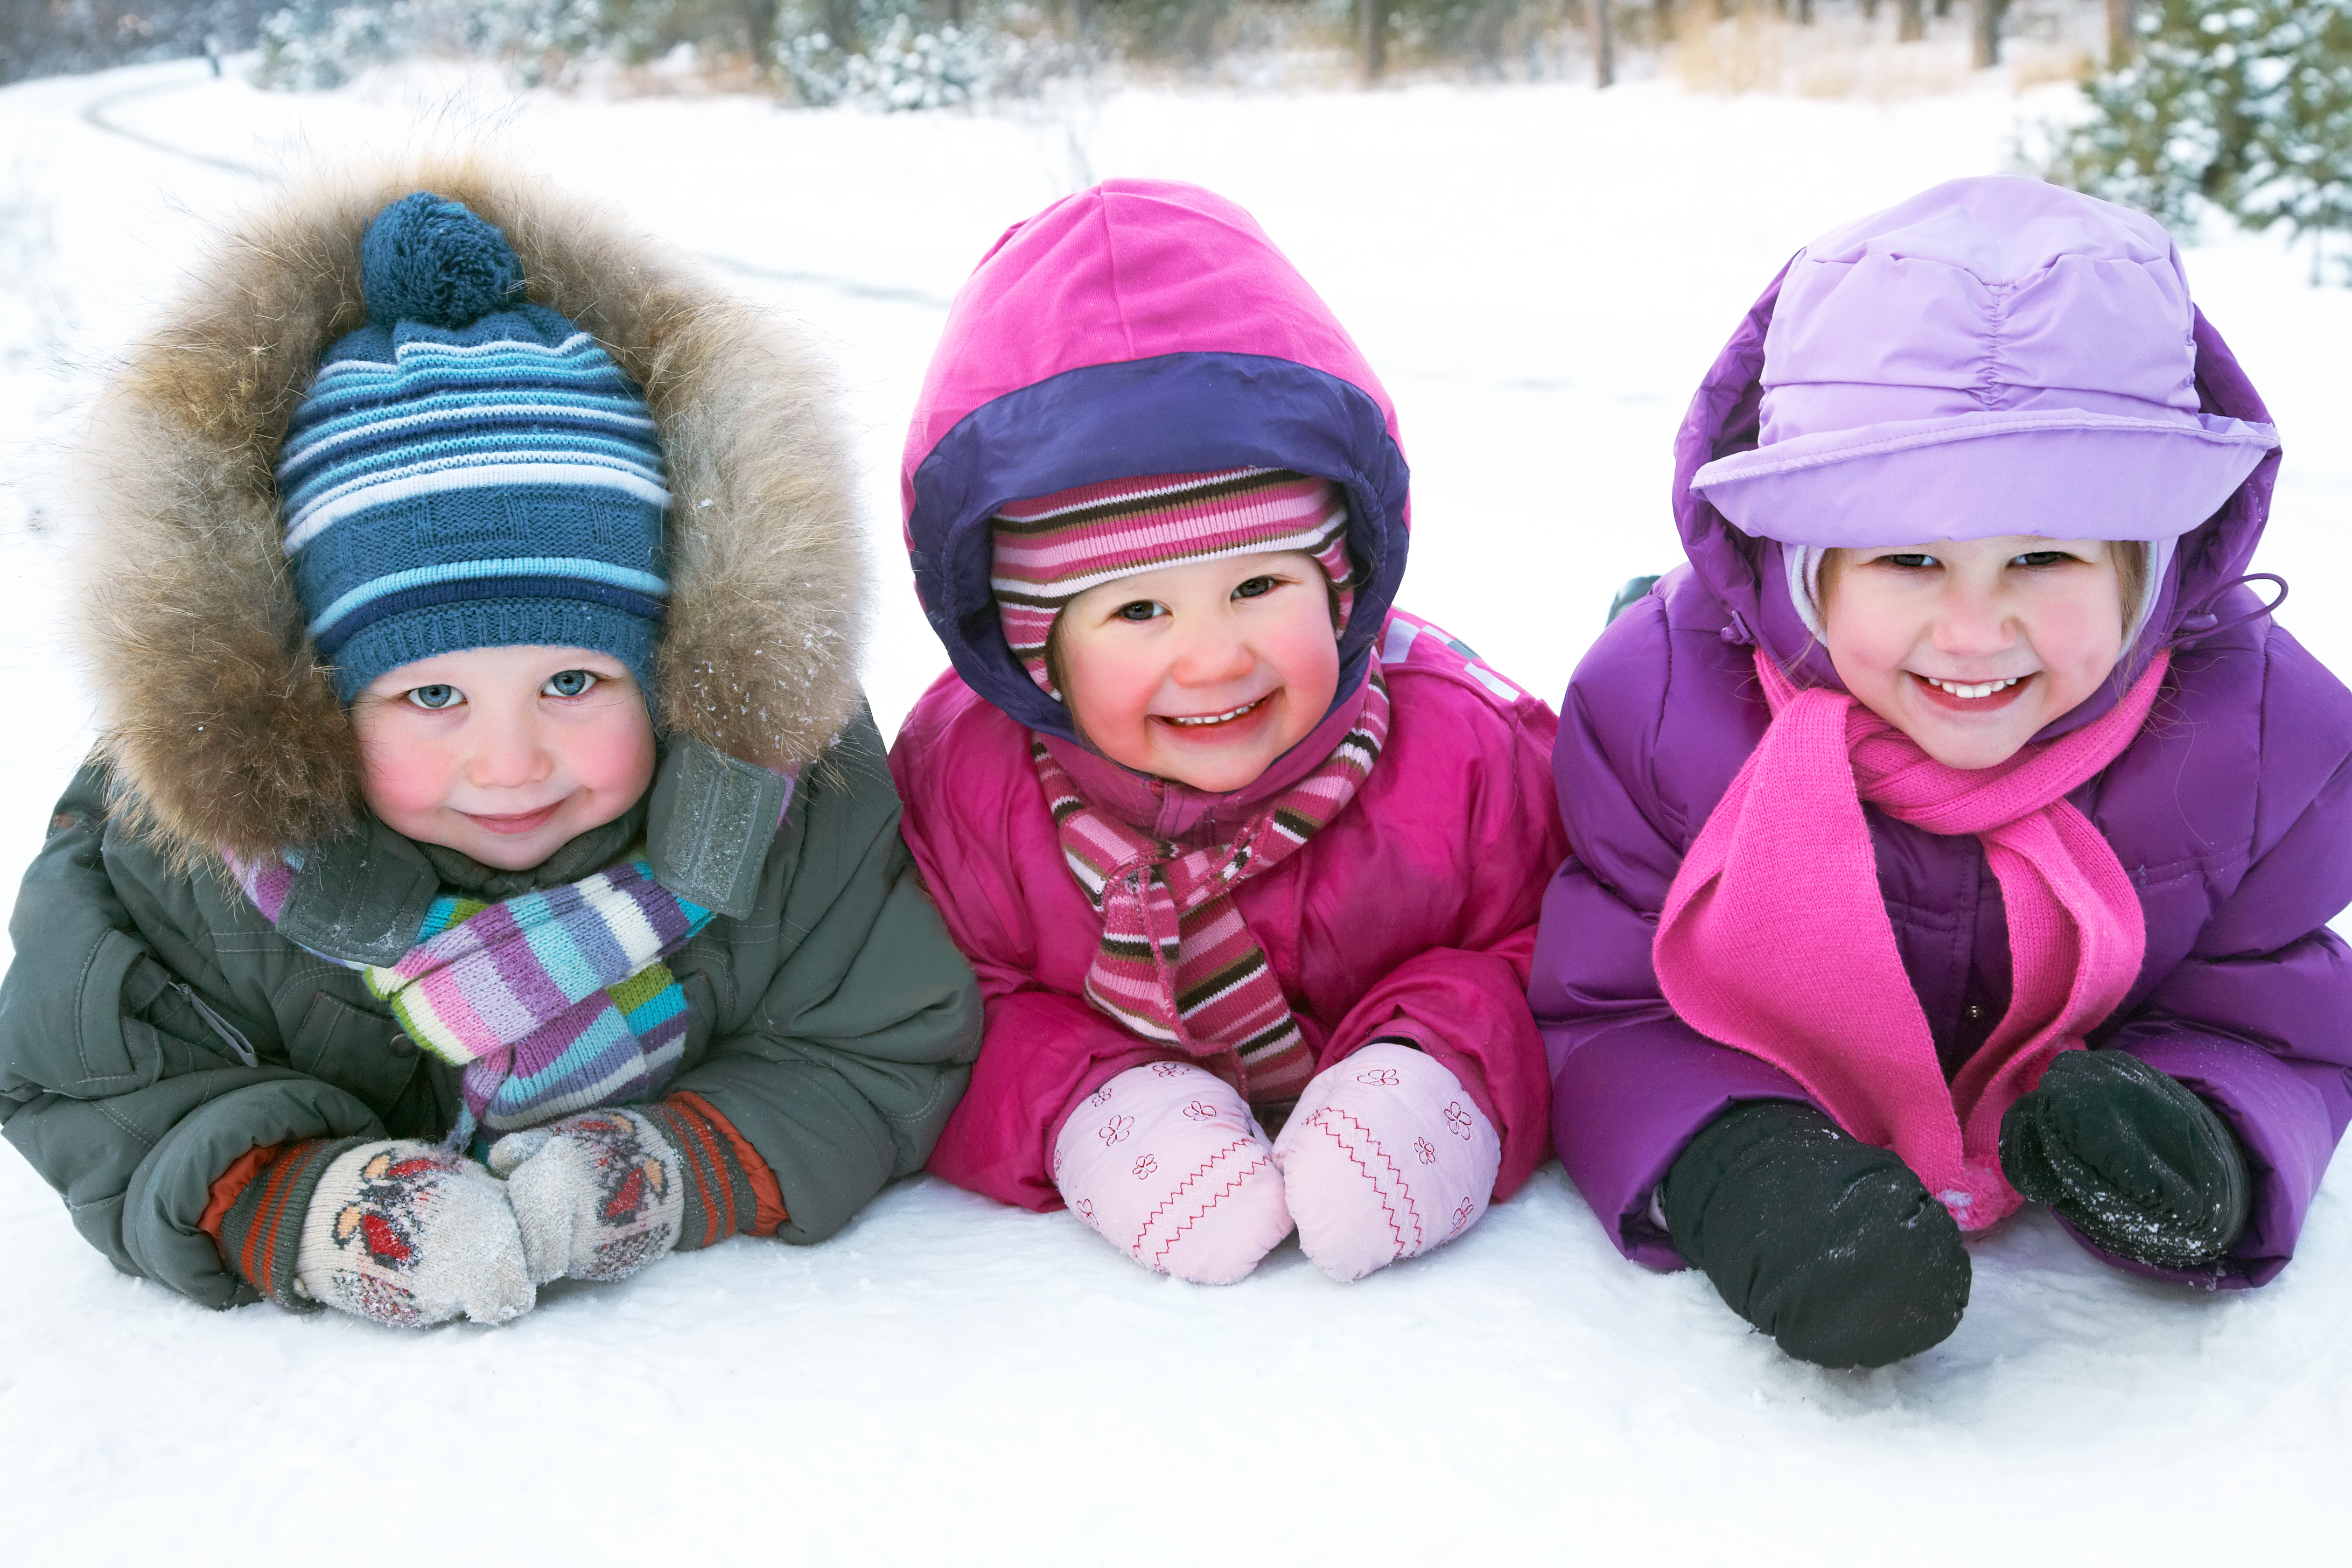 Kids laying in snow smiling